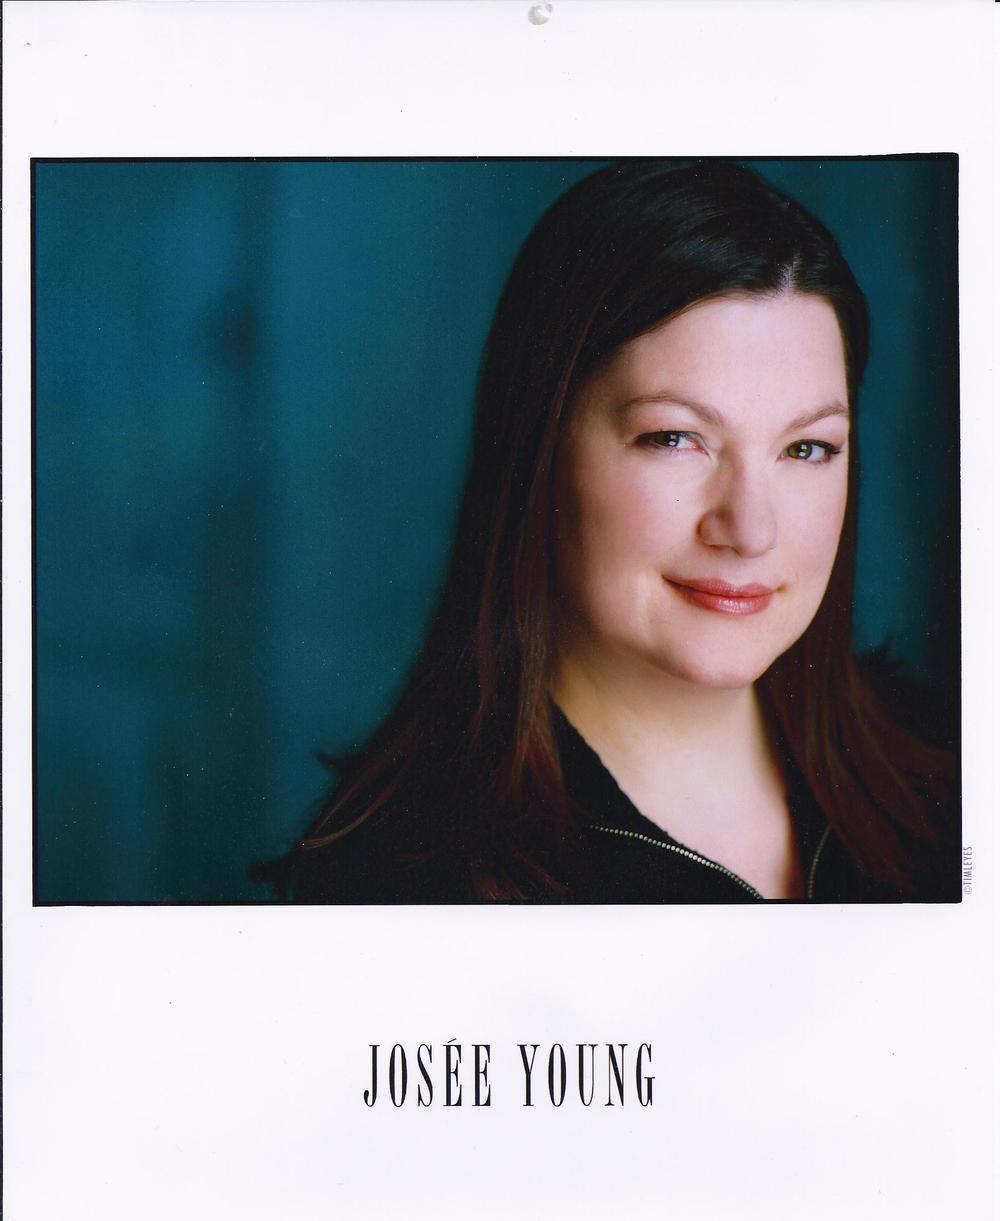 Josee Young